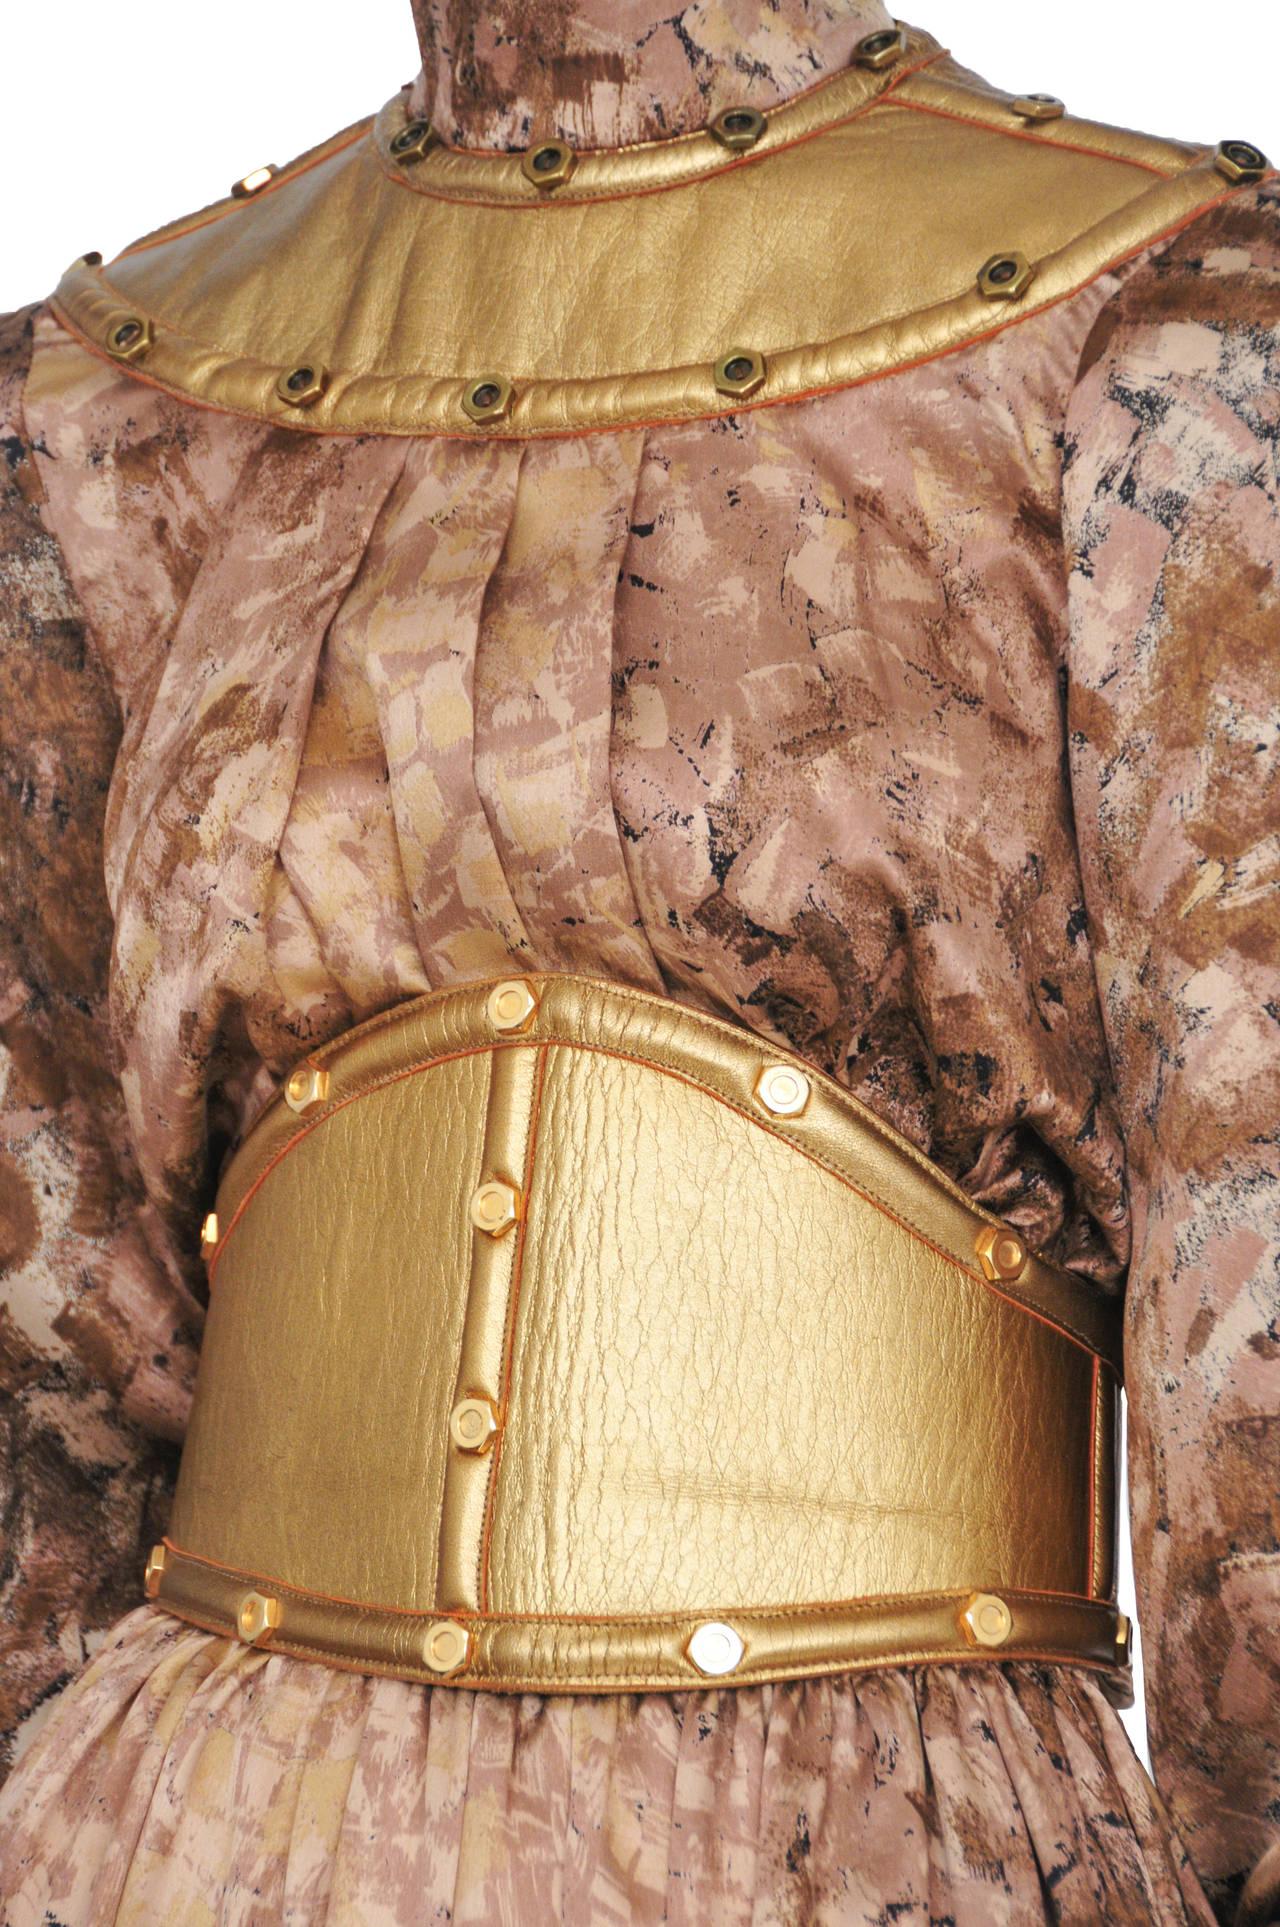 Thierry Mugler Rare Gold Tunic & Leather Belt 3